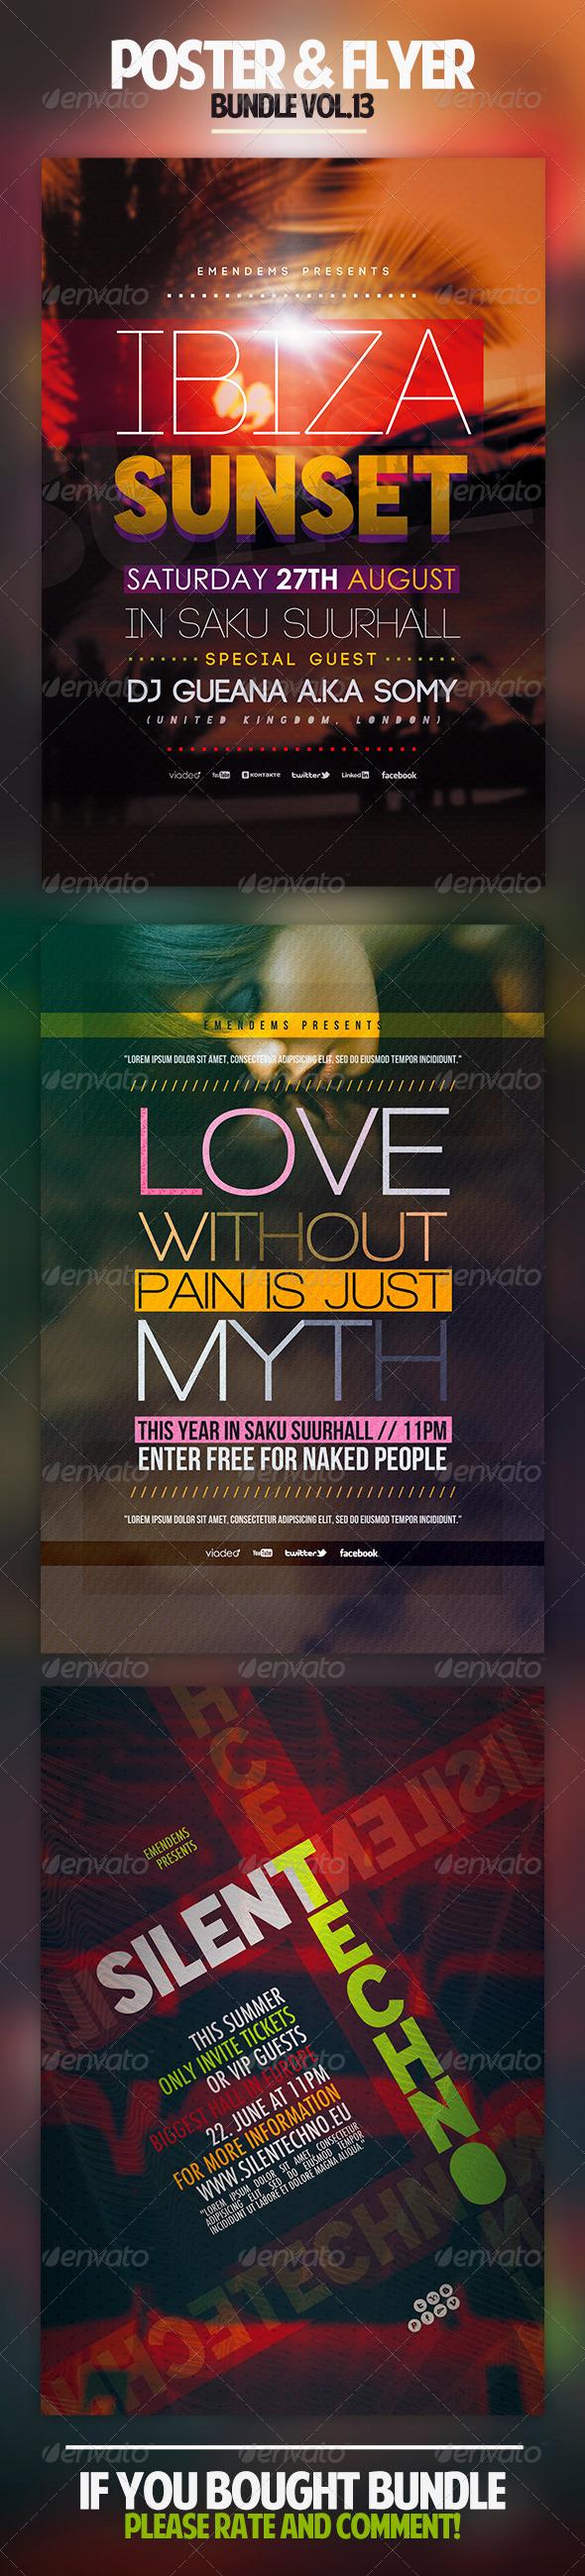 Poster & Flyer Bundle Vol.13 - Clubs & Parties Events